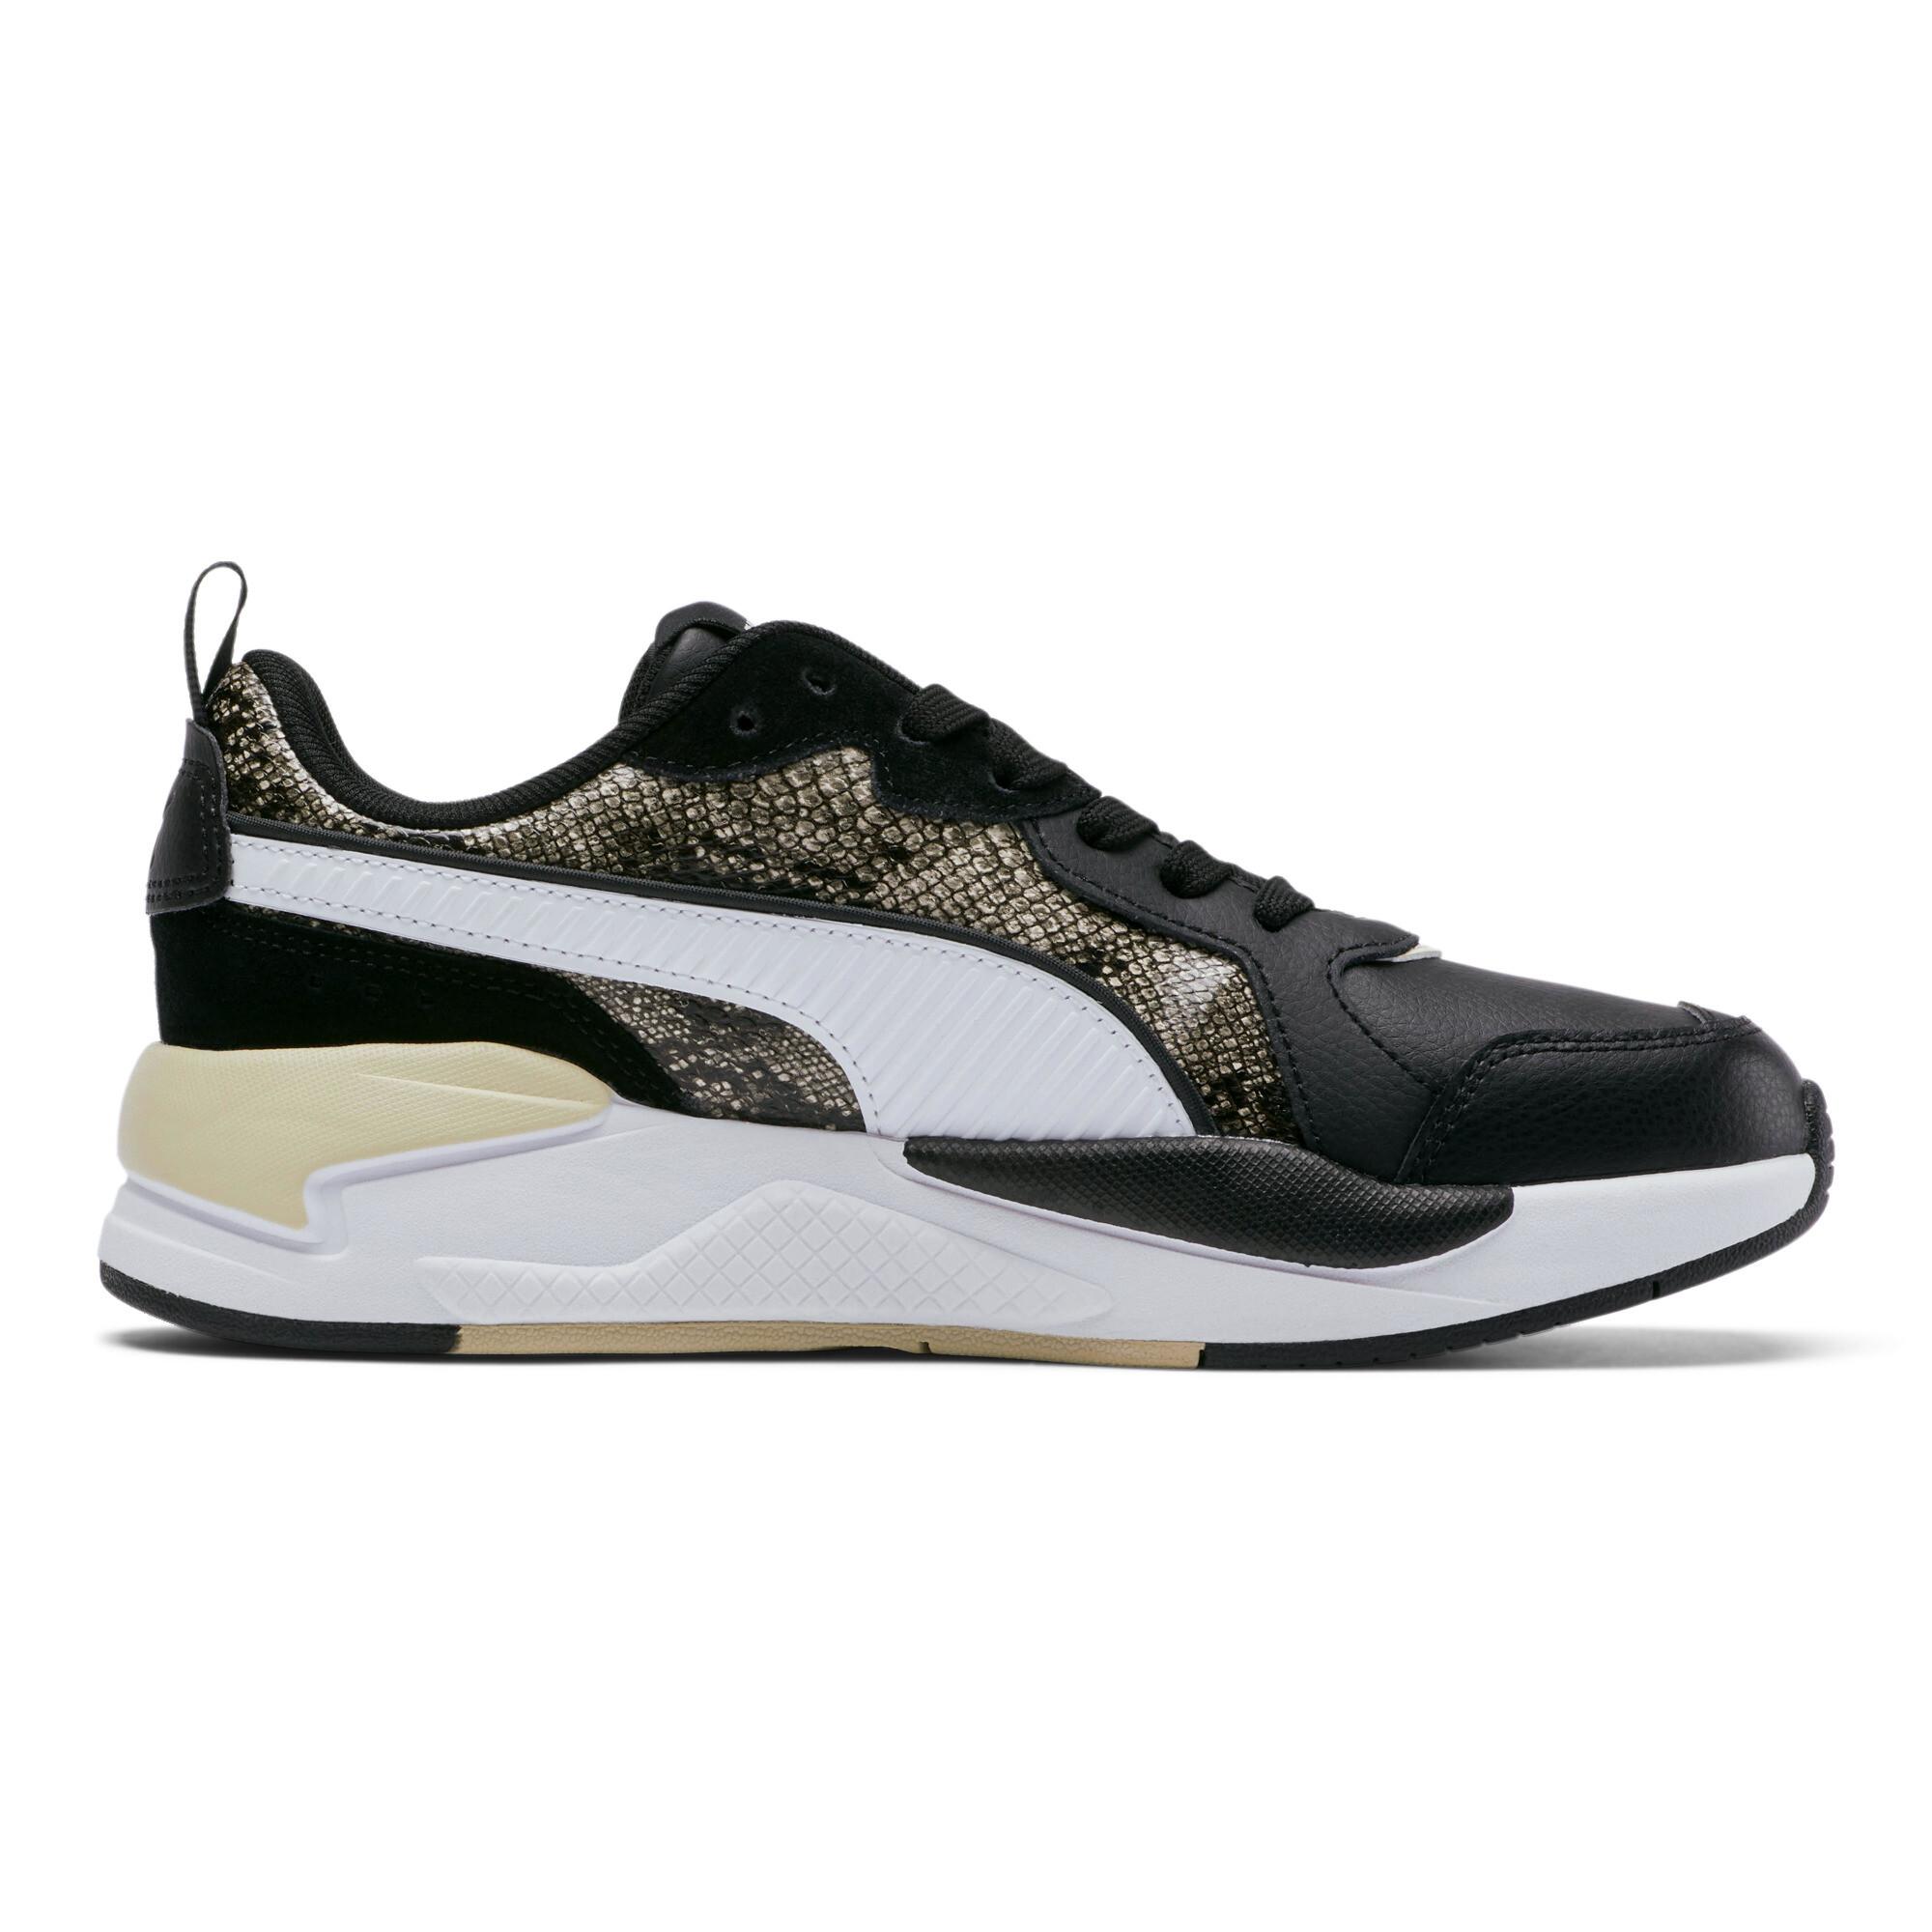 PUMA-Women-039-s-X-RAY-Reptile-Sneakers thumbnail 6